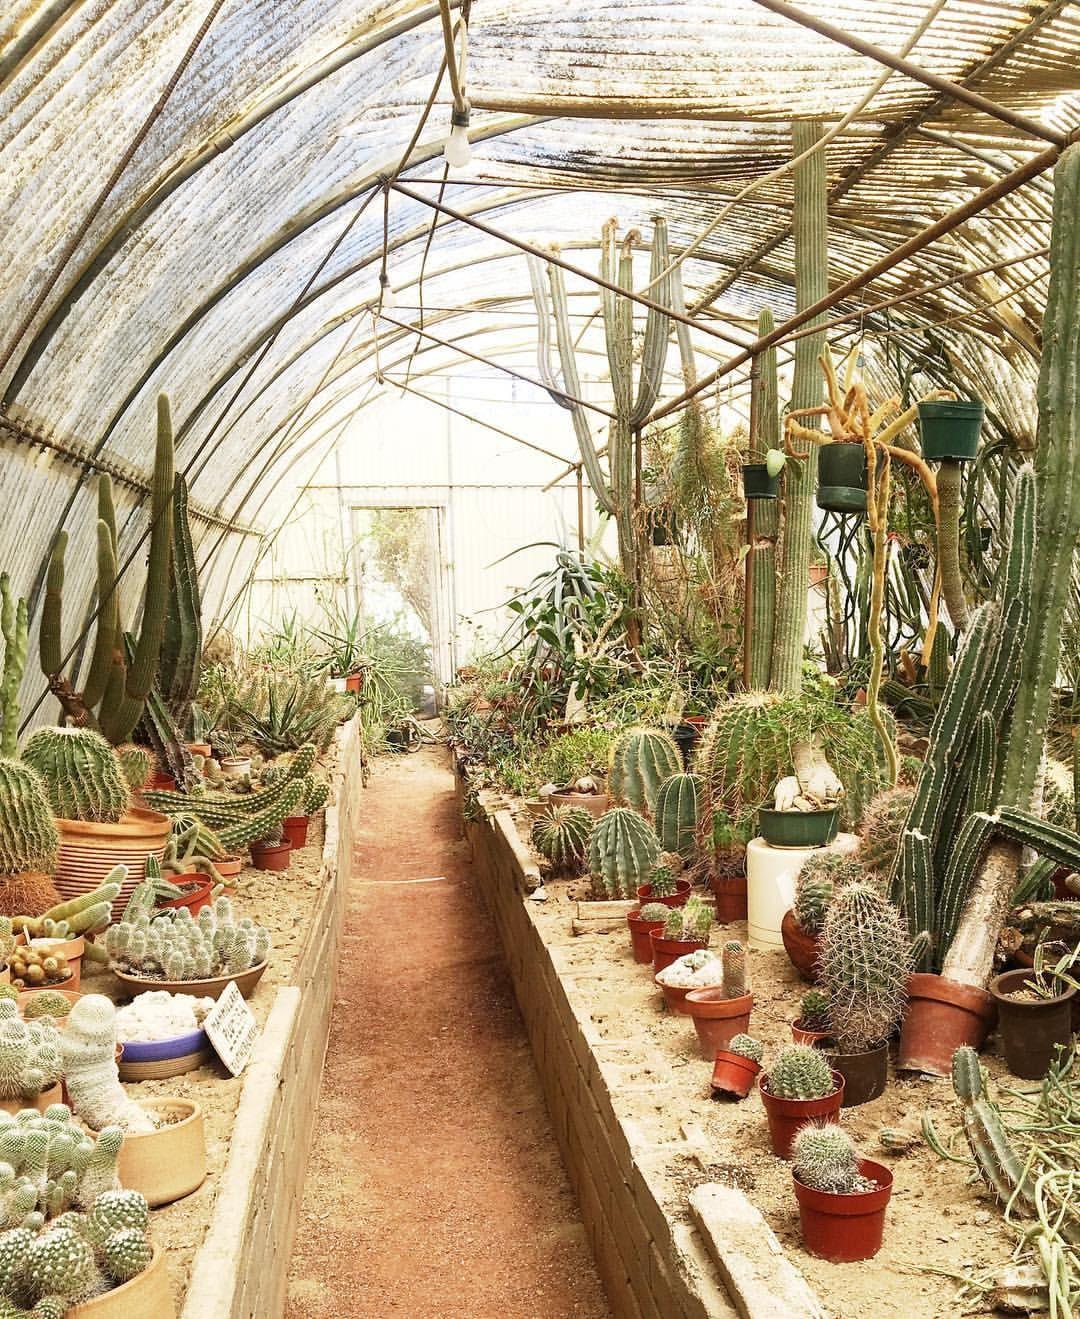 Patio Place Palm Desert Ca: Morten Botanical Garden Palm Springs, CA By @thegoodtwinco